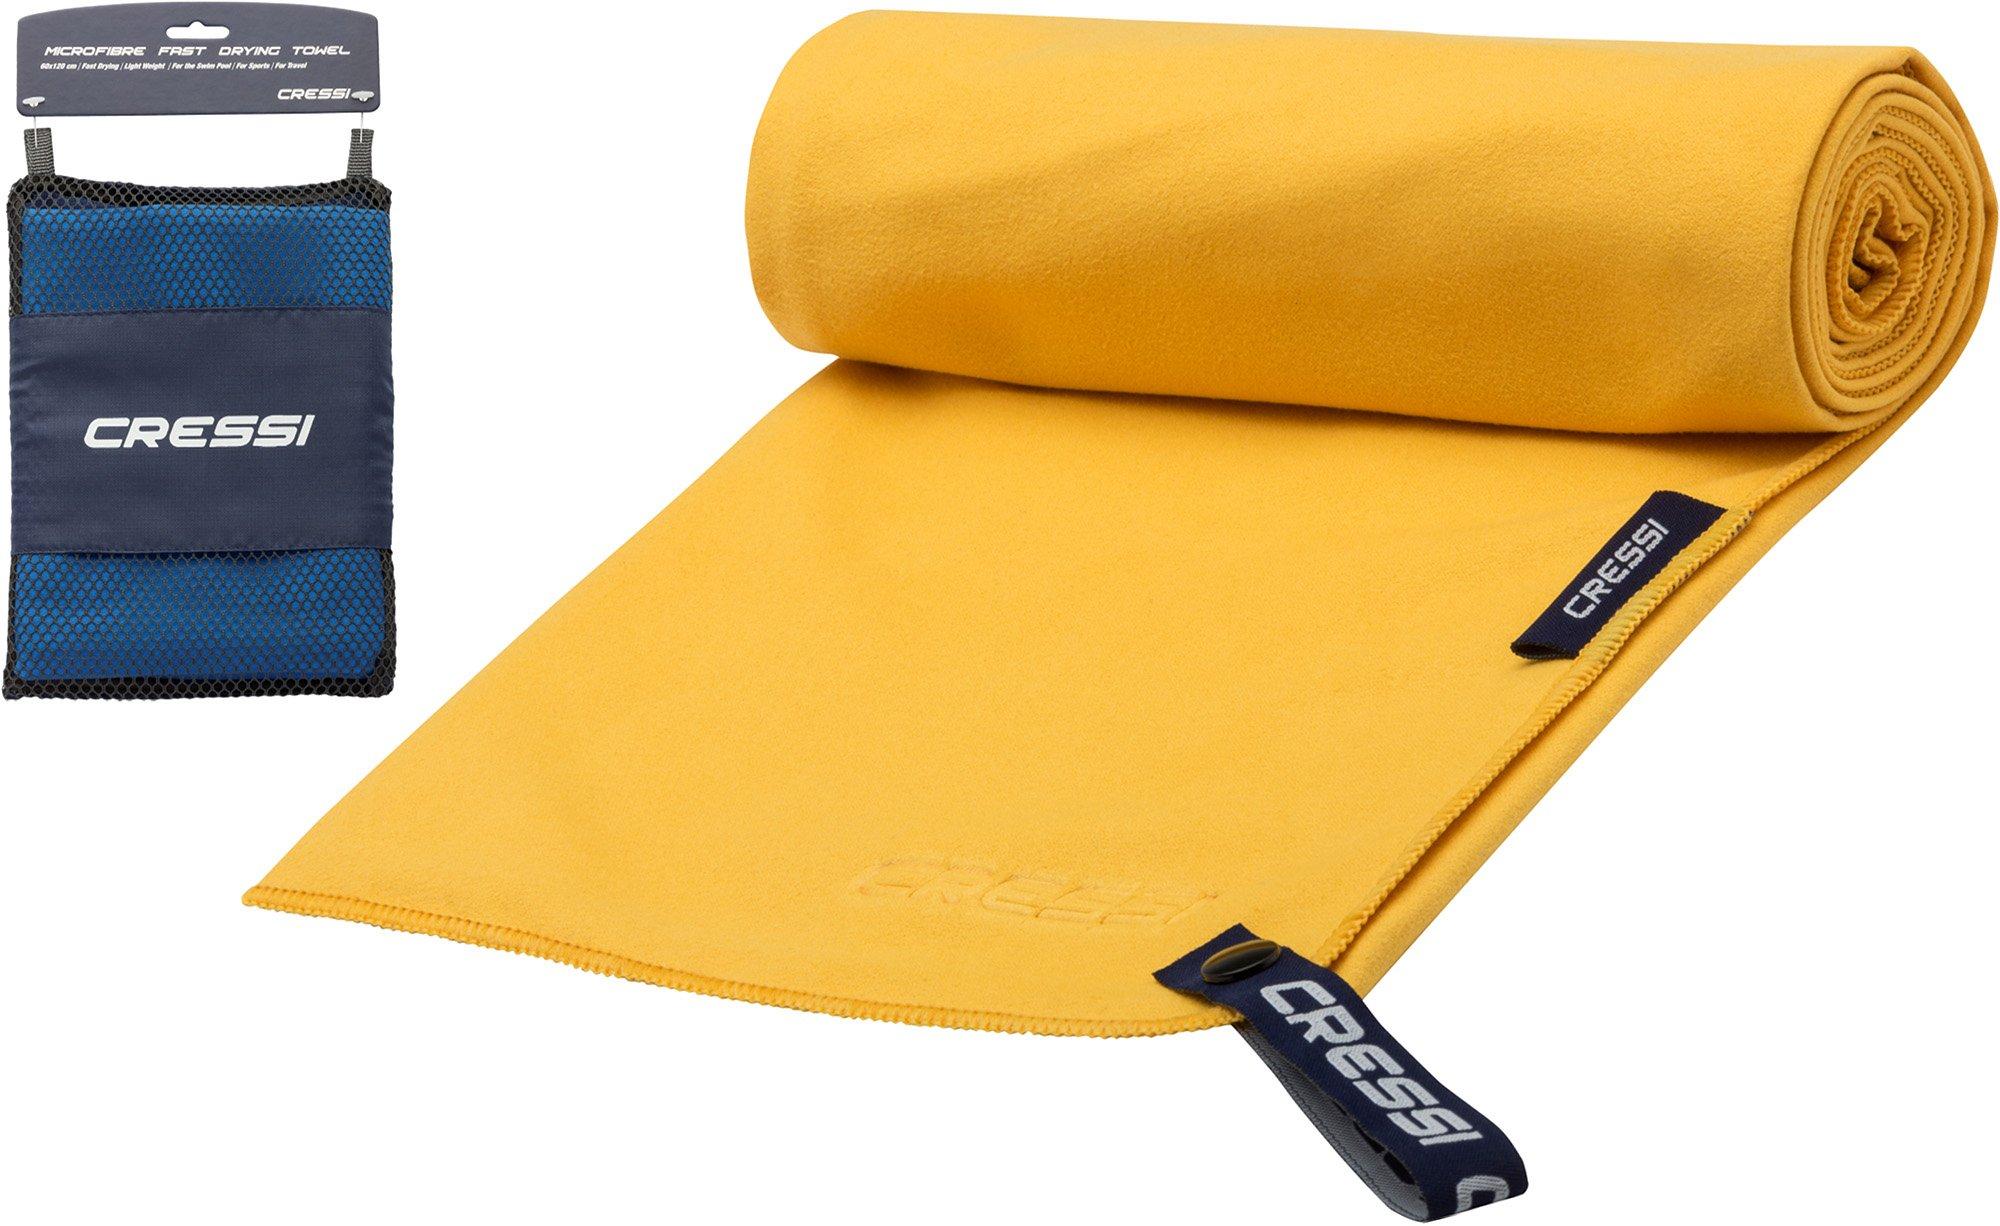 Cressi Microfibre Fast Drying Beach Towel Toalla de Sport, Unisex Adulto, Amarillo, 90x180cm